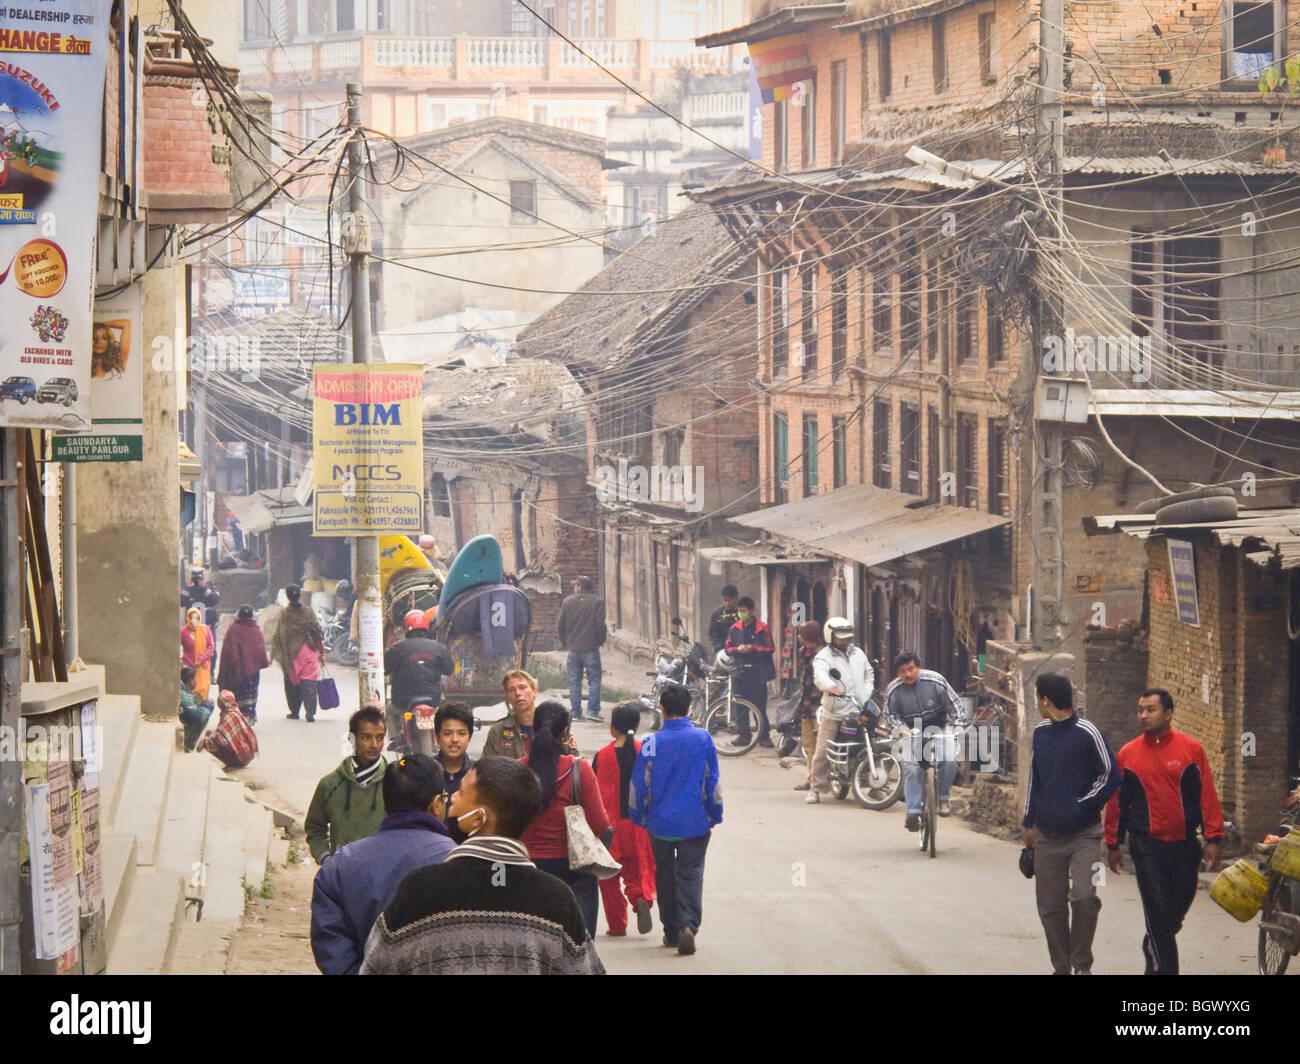 A busy street with many powerlines in Katmandu, Nepal. - Stock Image